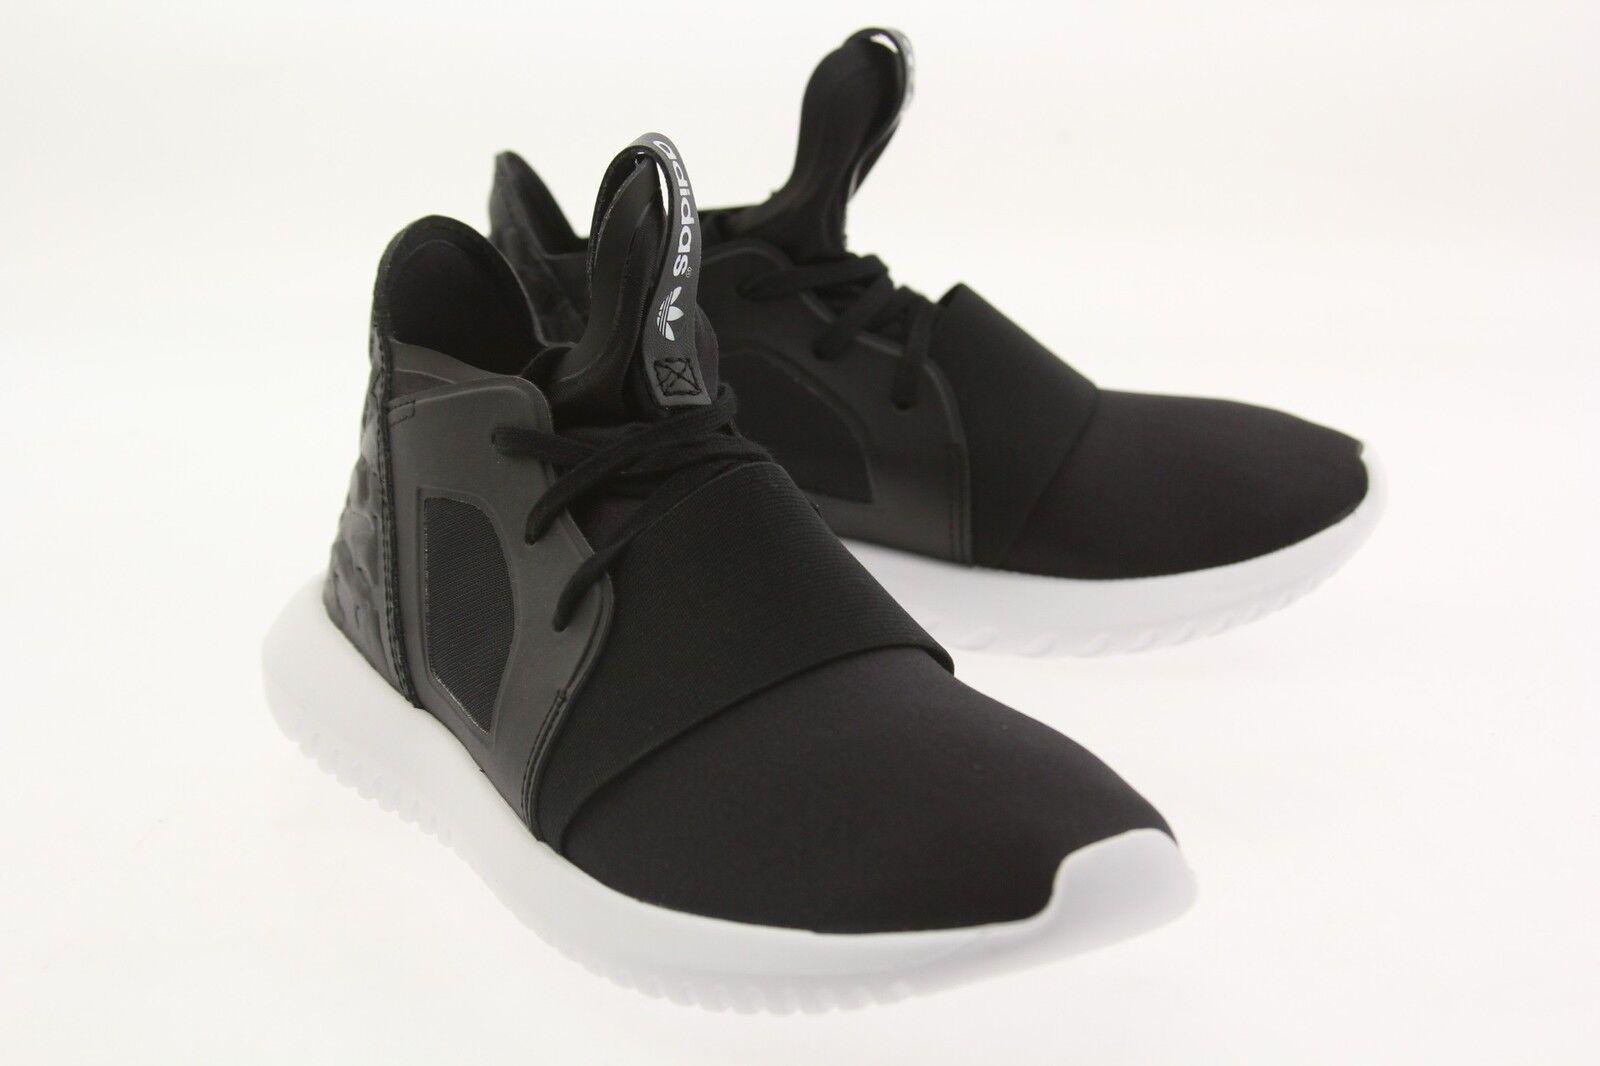 Adidas Women Tubular Defiant black core black  core white white white S75257 259092